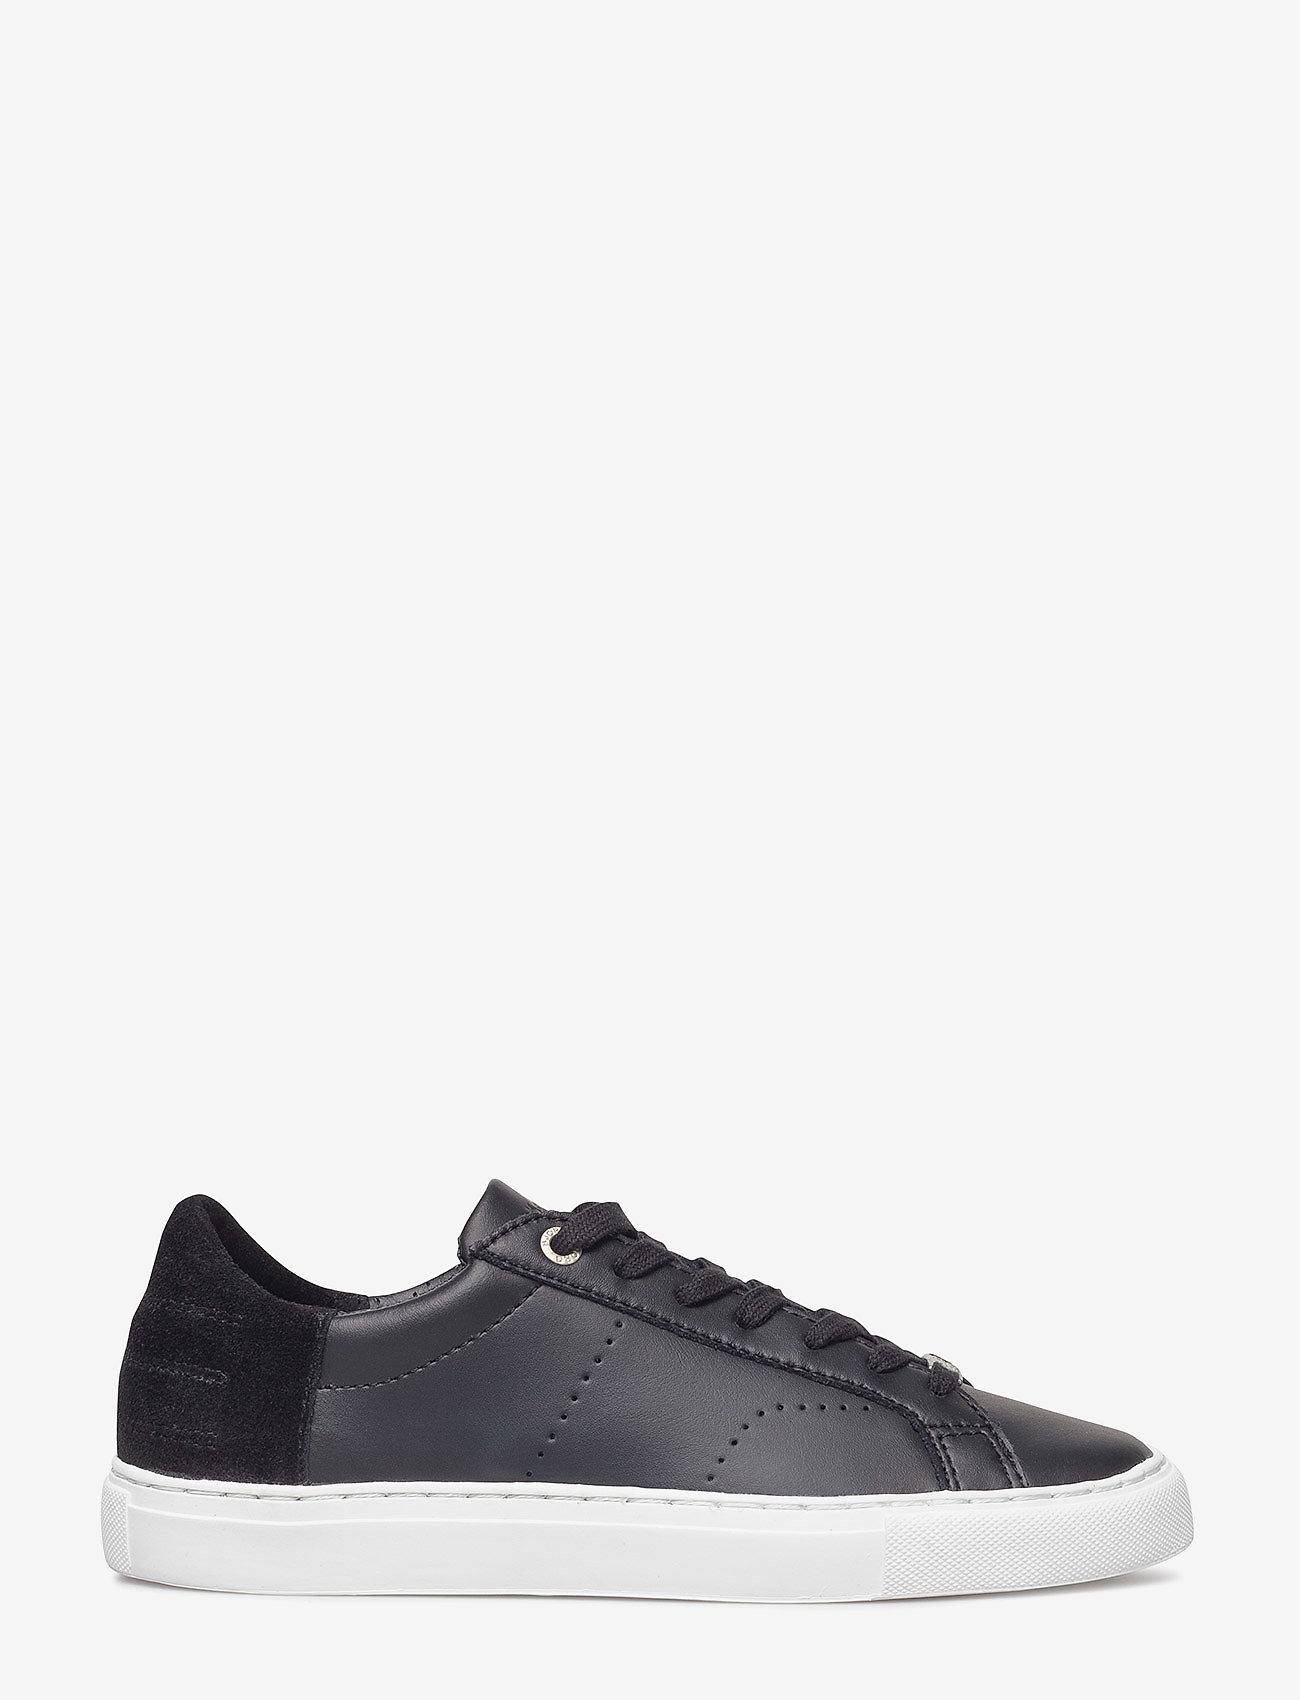 Björn Borg - T200 Low Fcy W - low top sneakers - black - 1